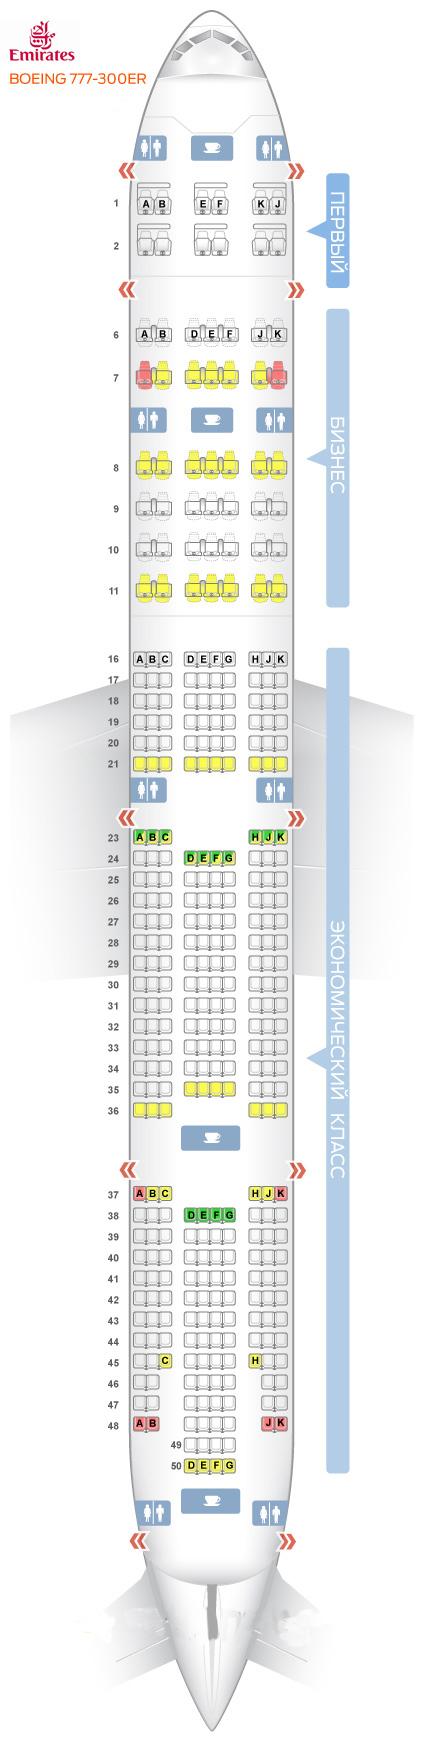 Эмирейтс Boeing 777 300 ER схема салона